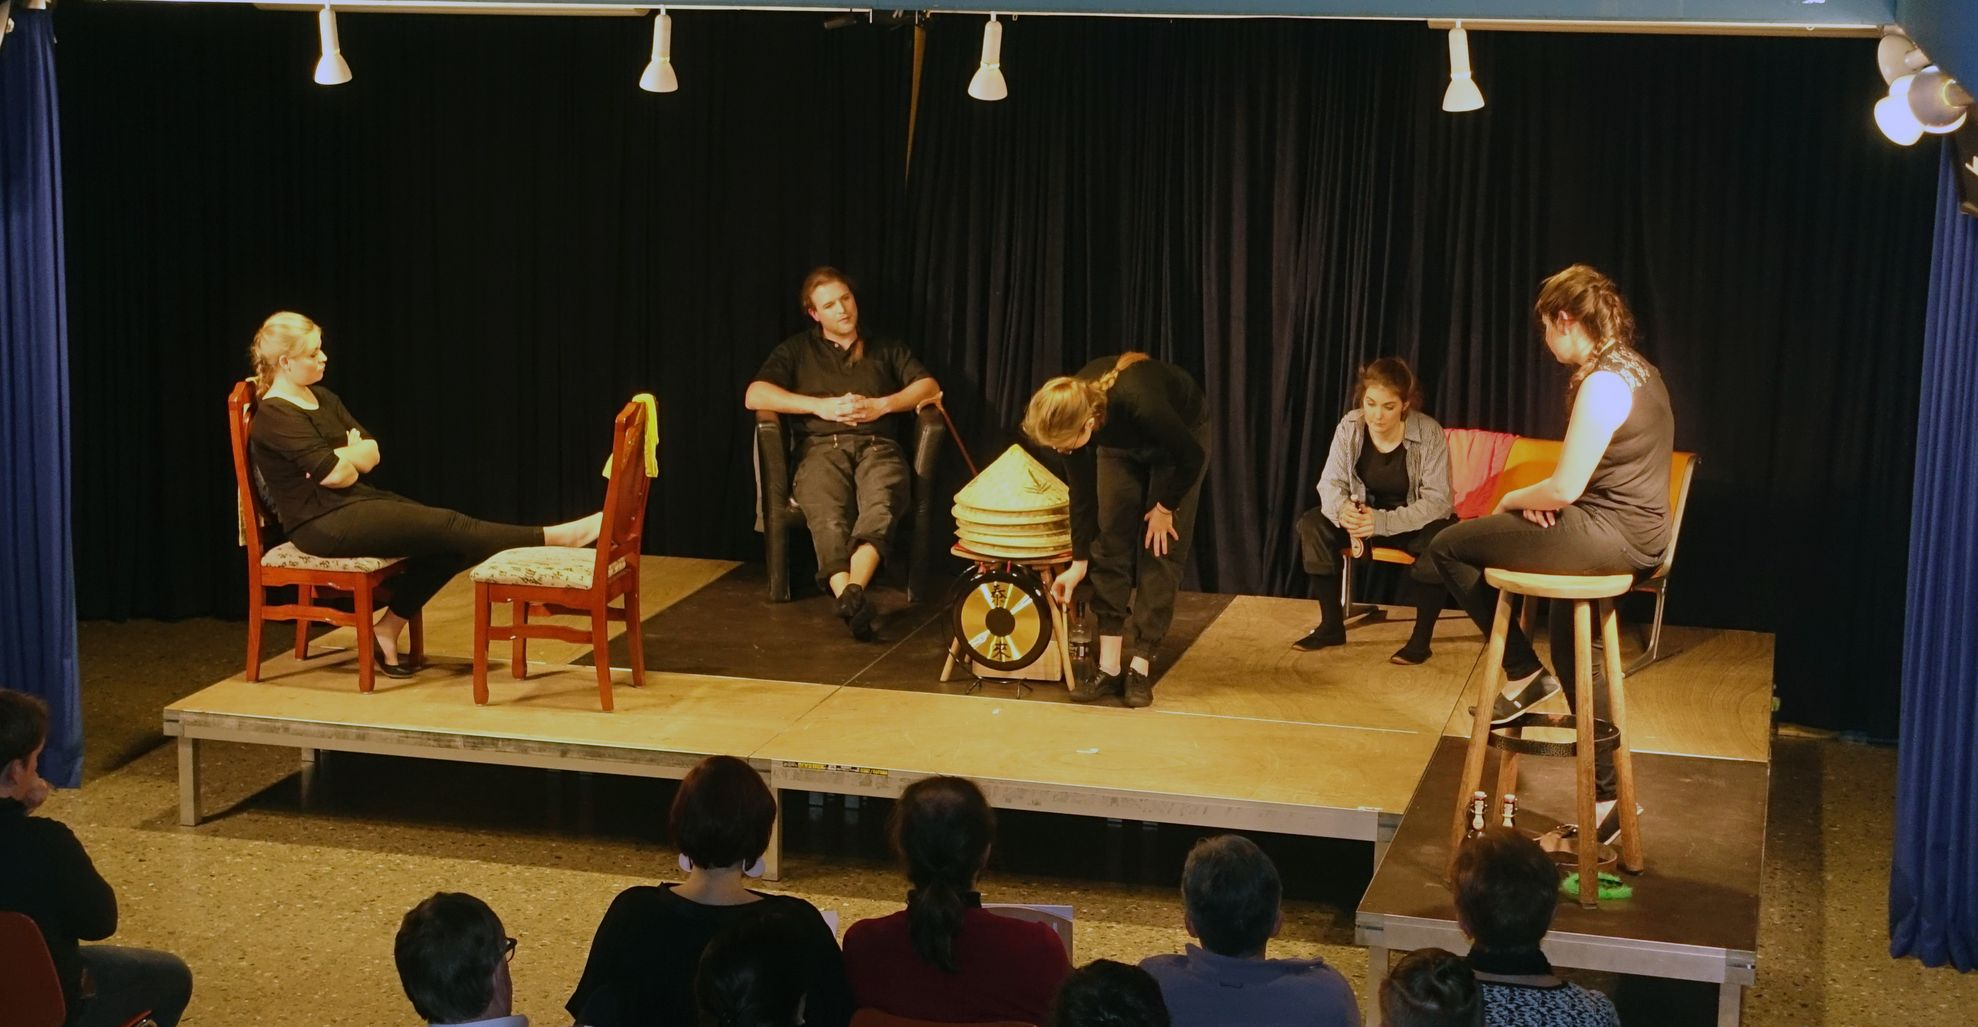 Theatergruppe [drai`zam] - Bild 2